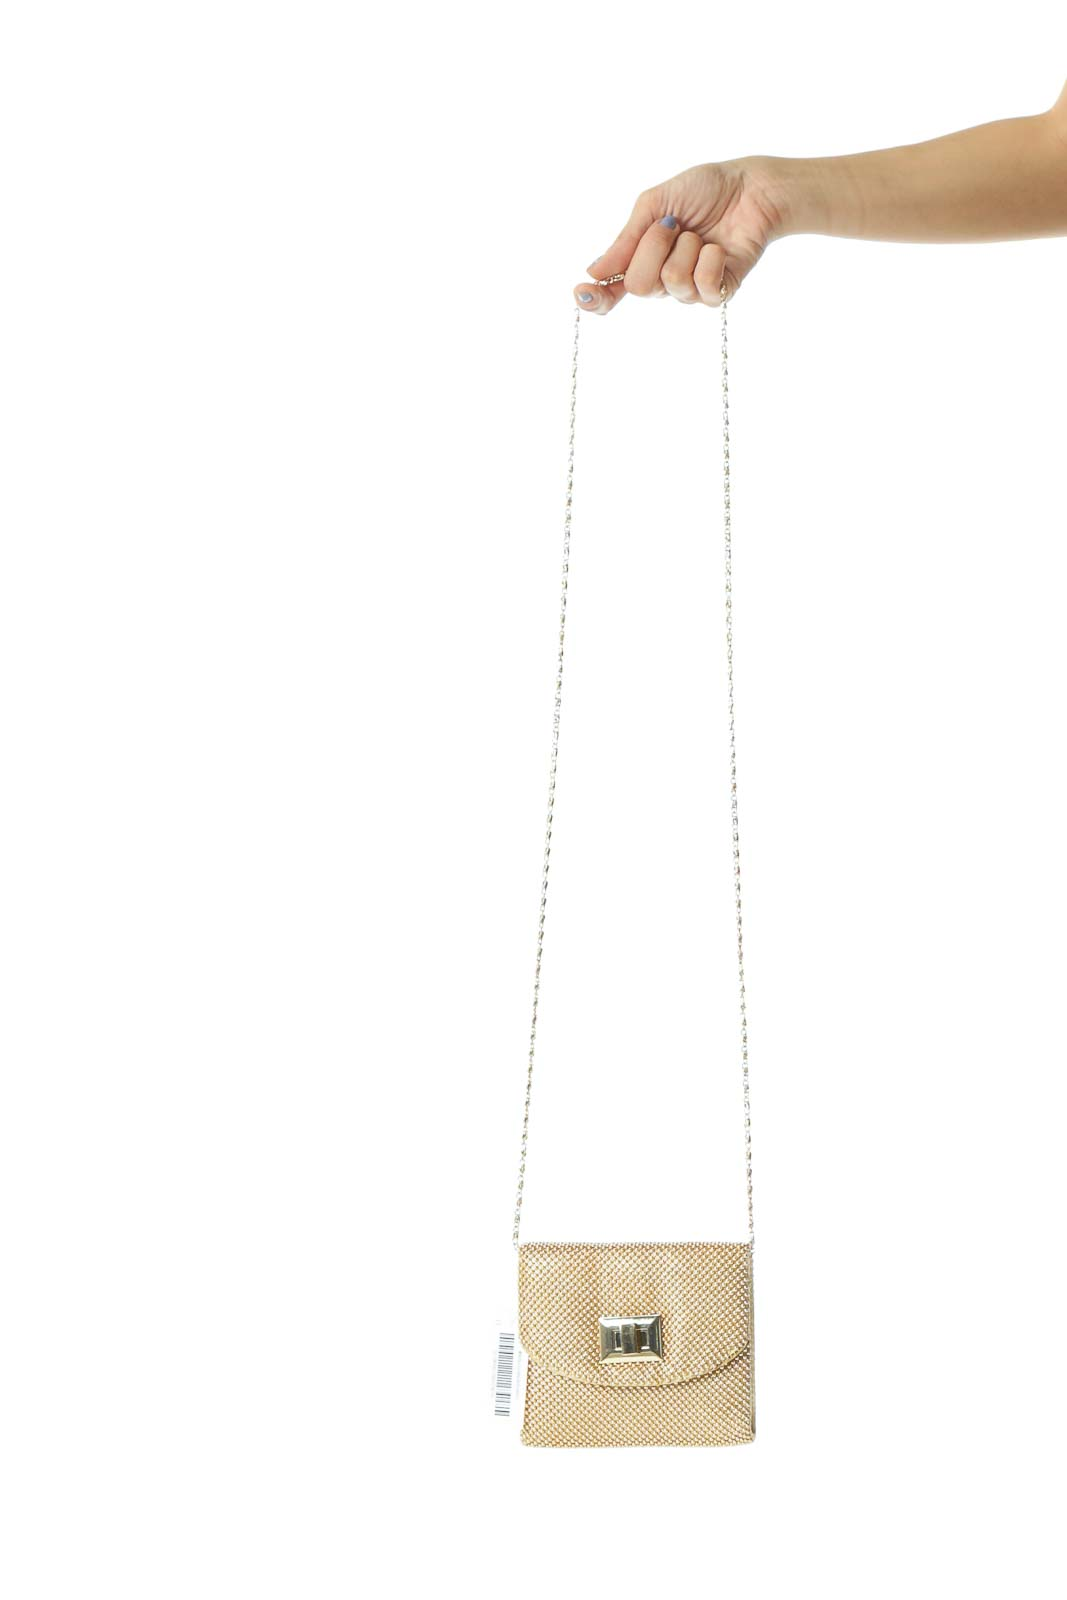 Gold Metallic Beads Chain Metallic-Closure Bag Front